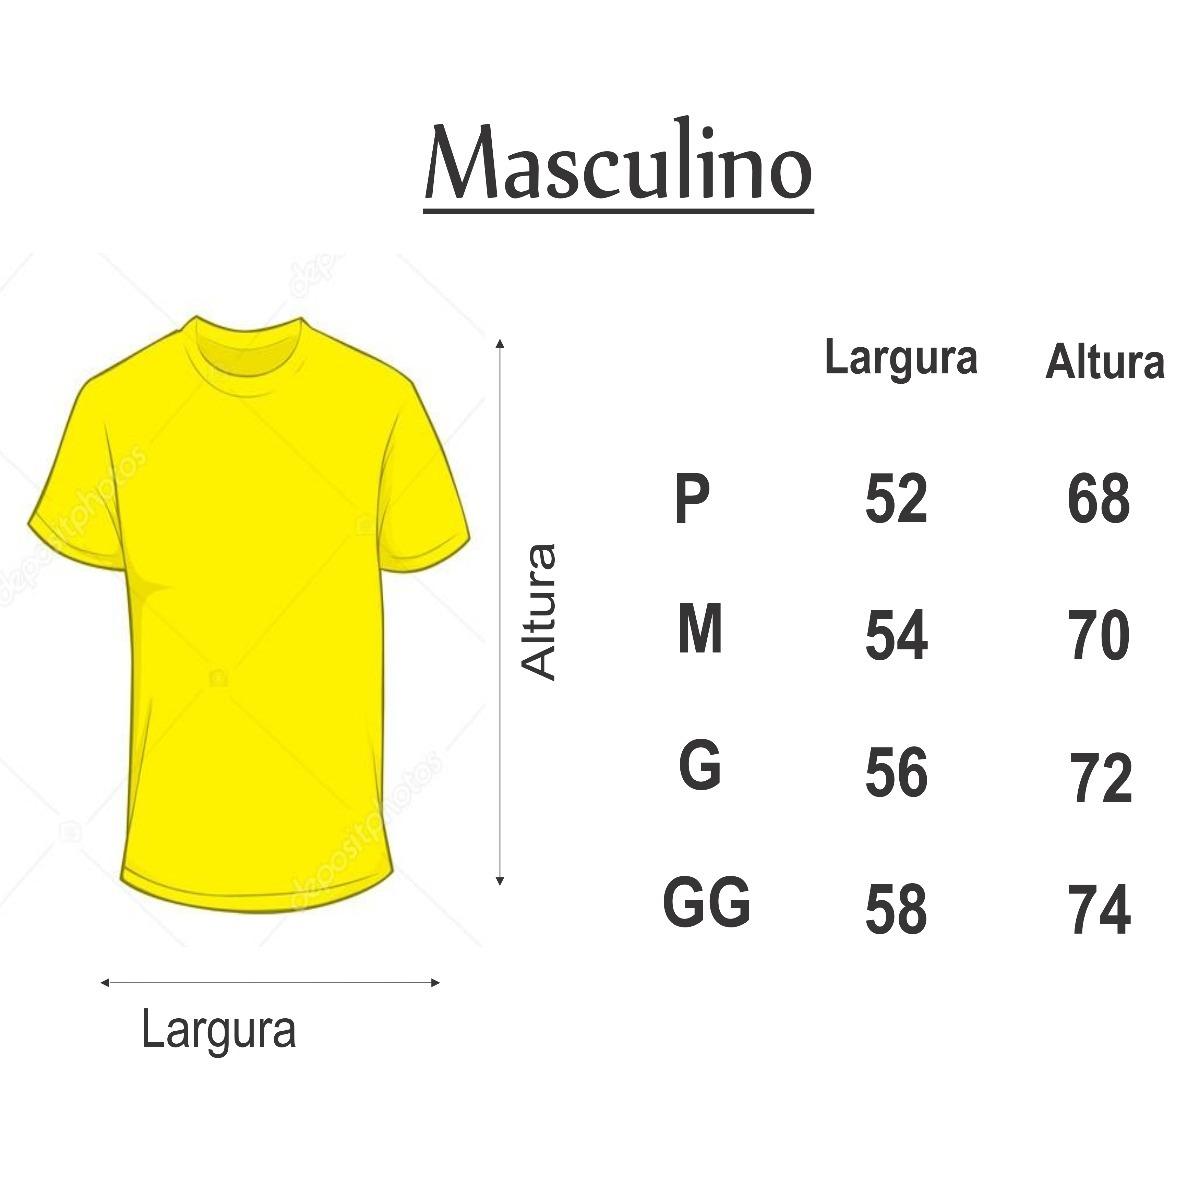 ... 1766033f17d camisa brasil rumo ao hexa copa do mundo personalizada nome.  Carregando zoom. ... 52712ee7b85